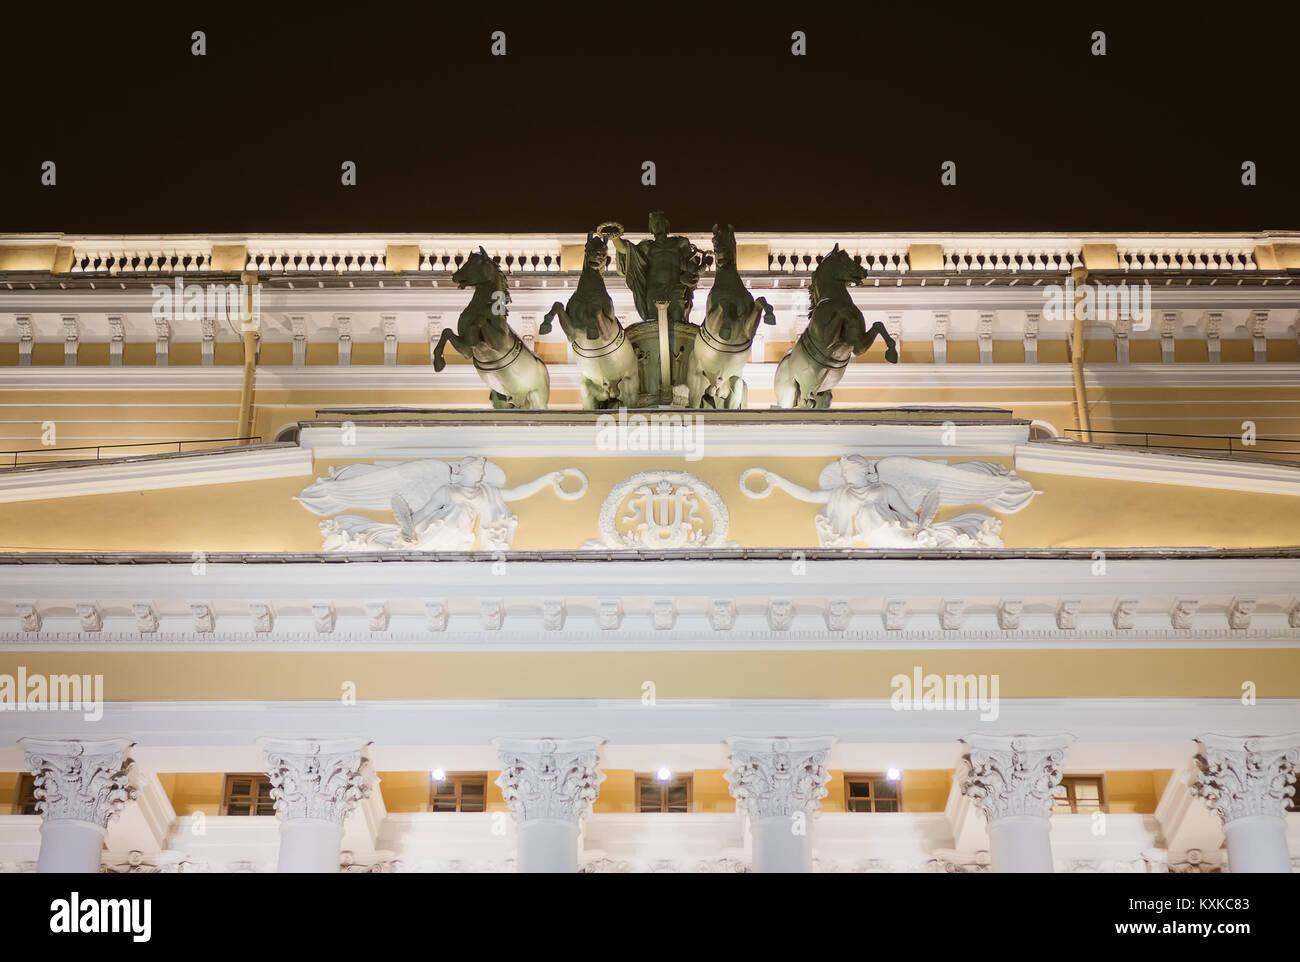 Alexandrinsky Theatre in Saint Petersburg at night. - Stock Image